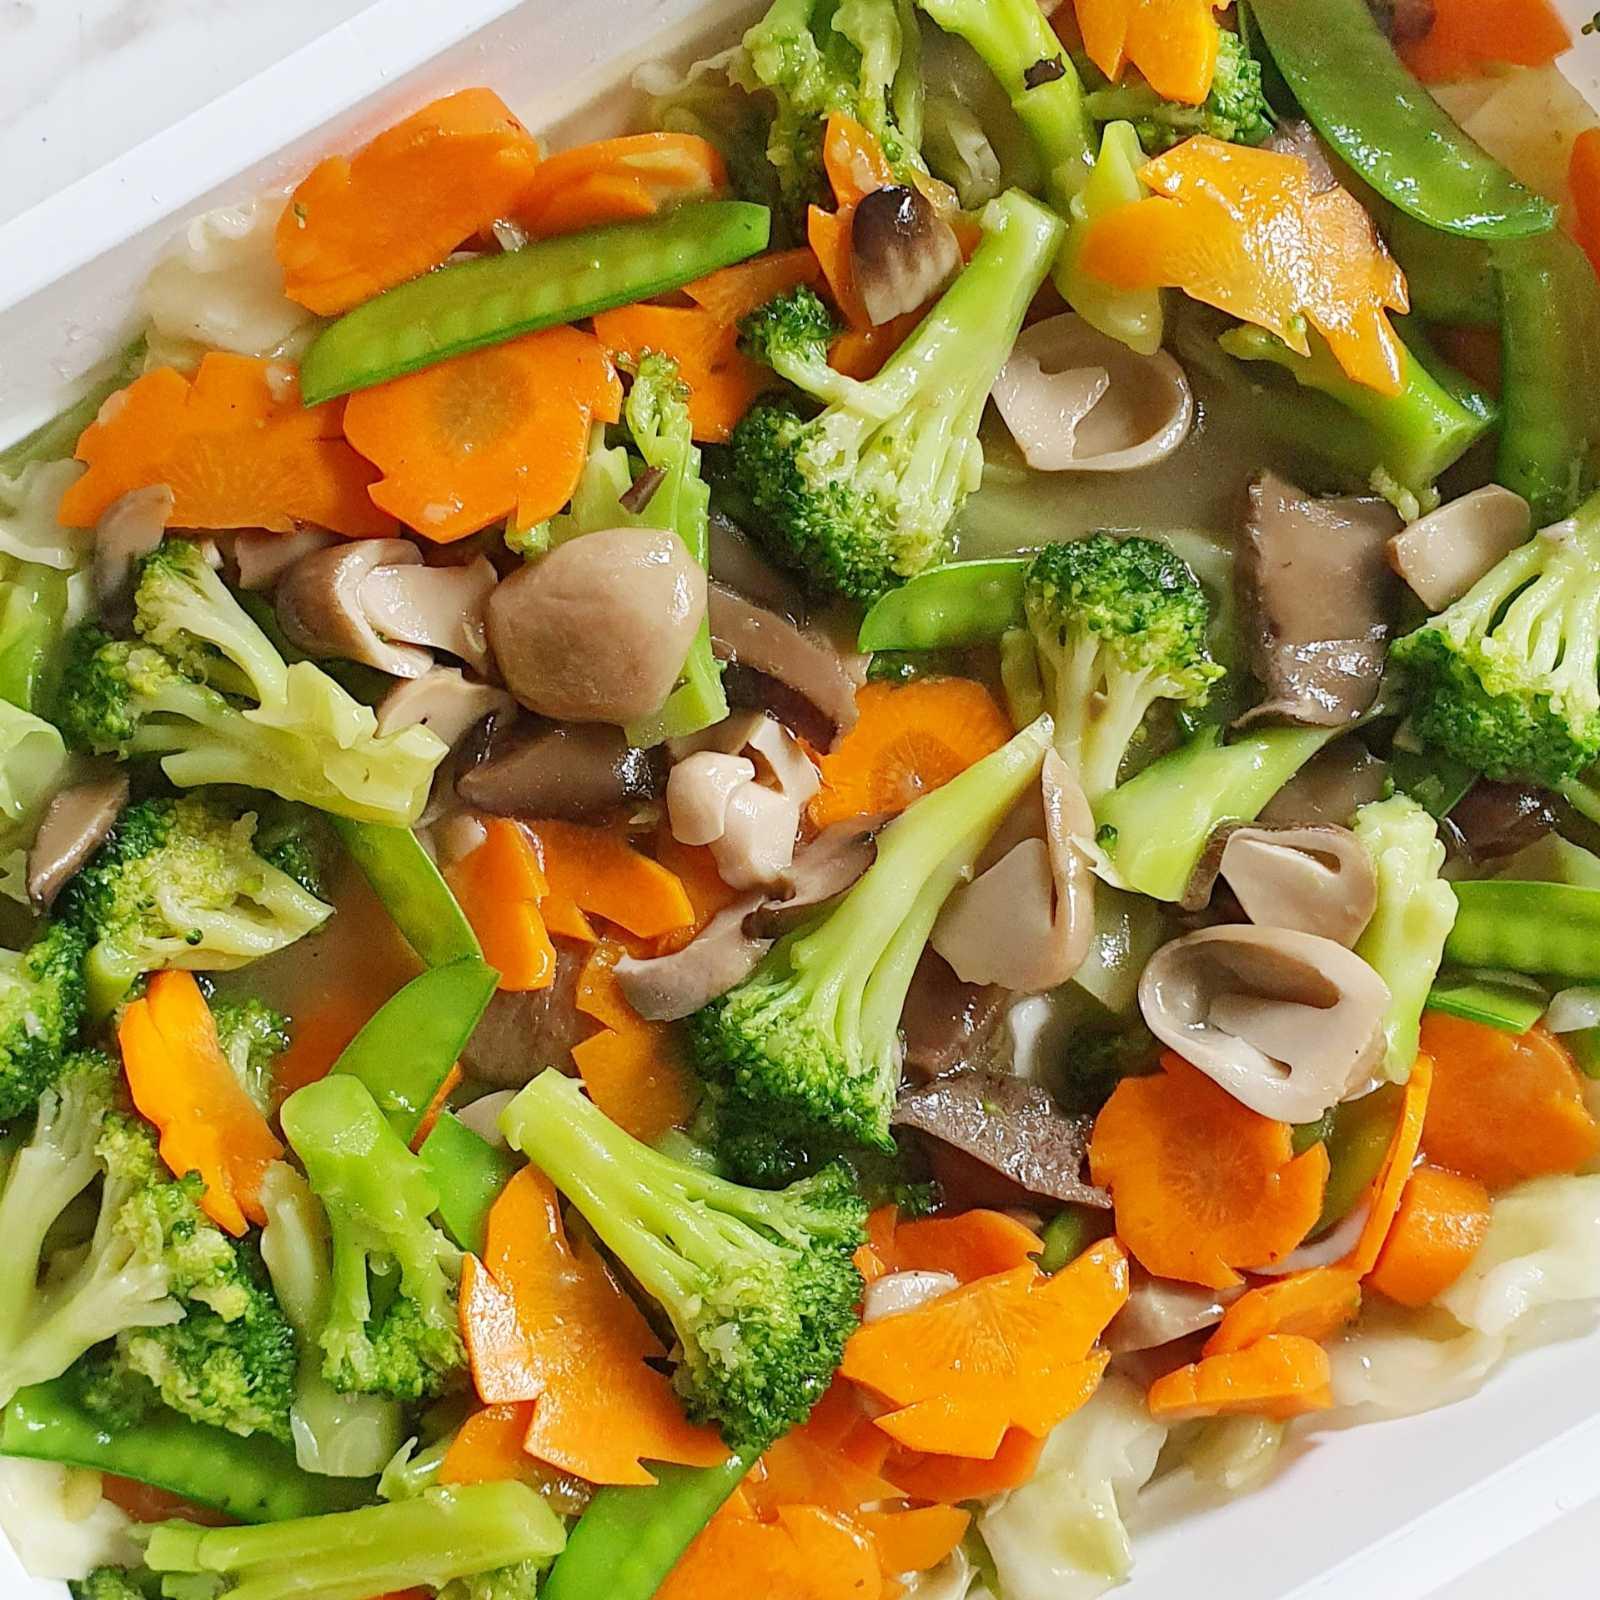 Special mix Vegetables